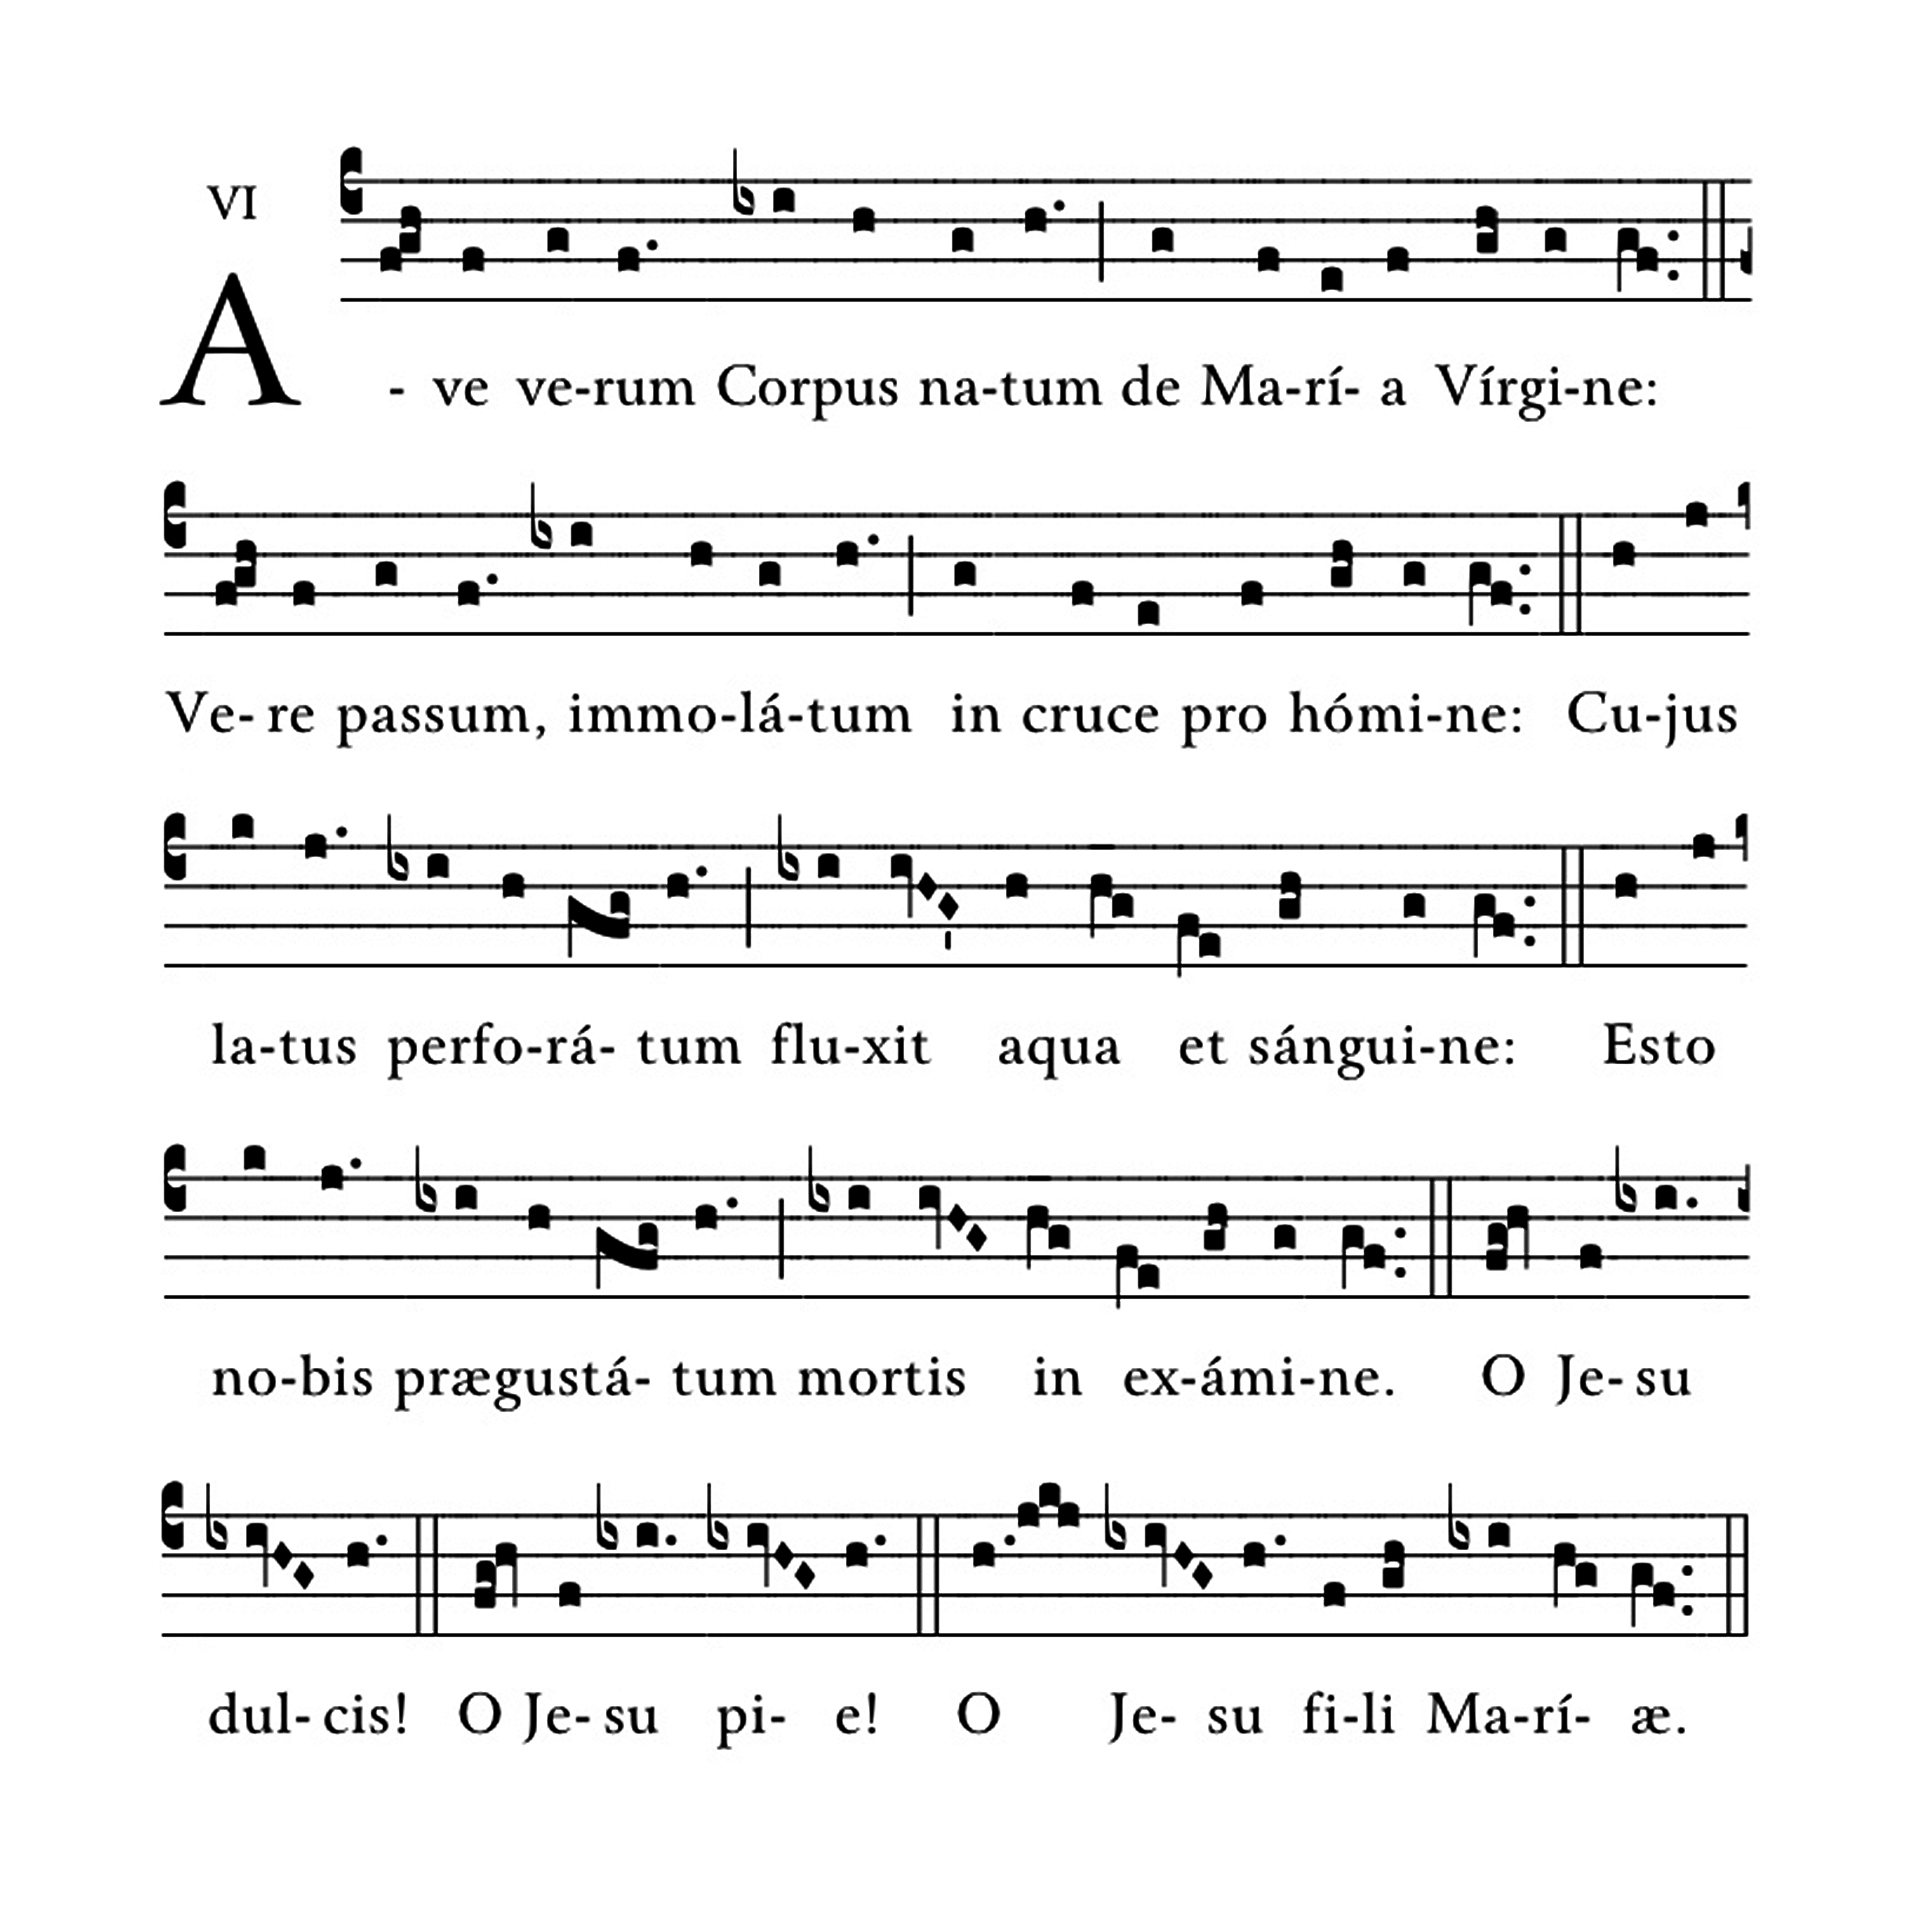 Ave verum Corpus - notation